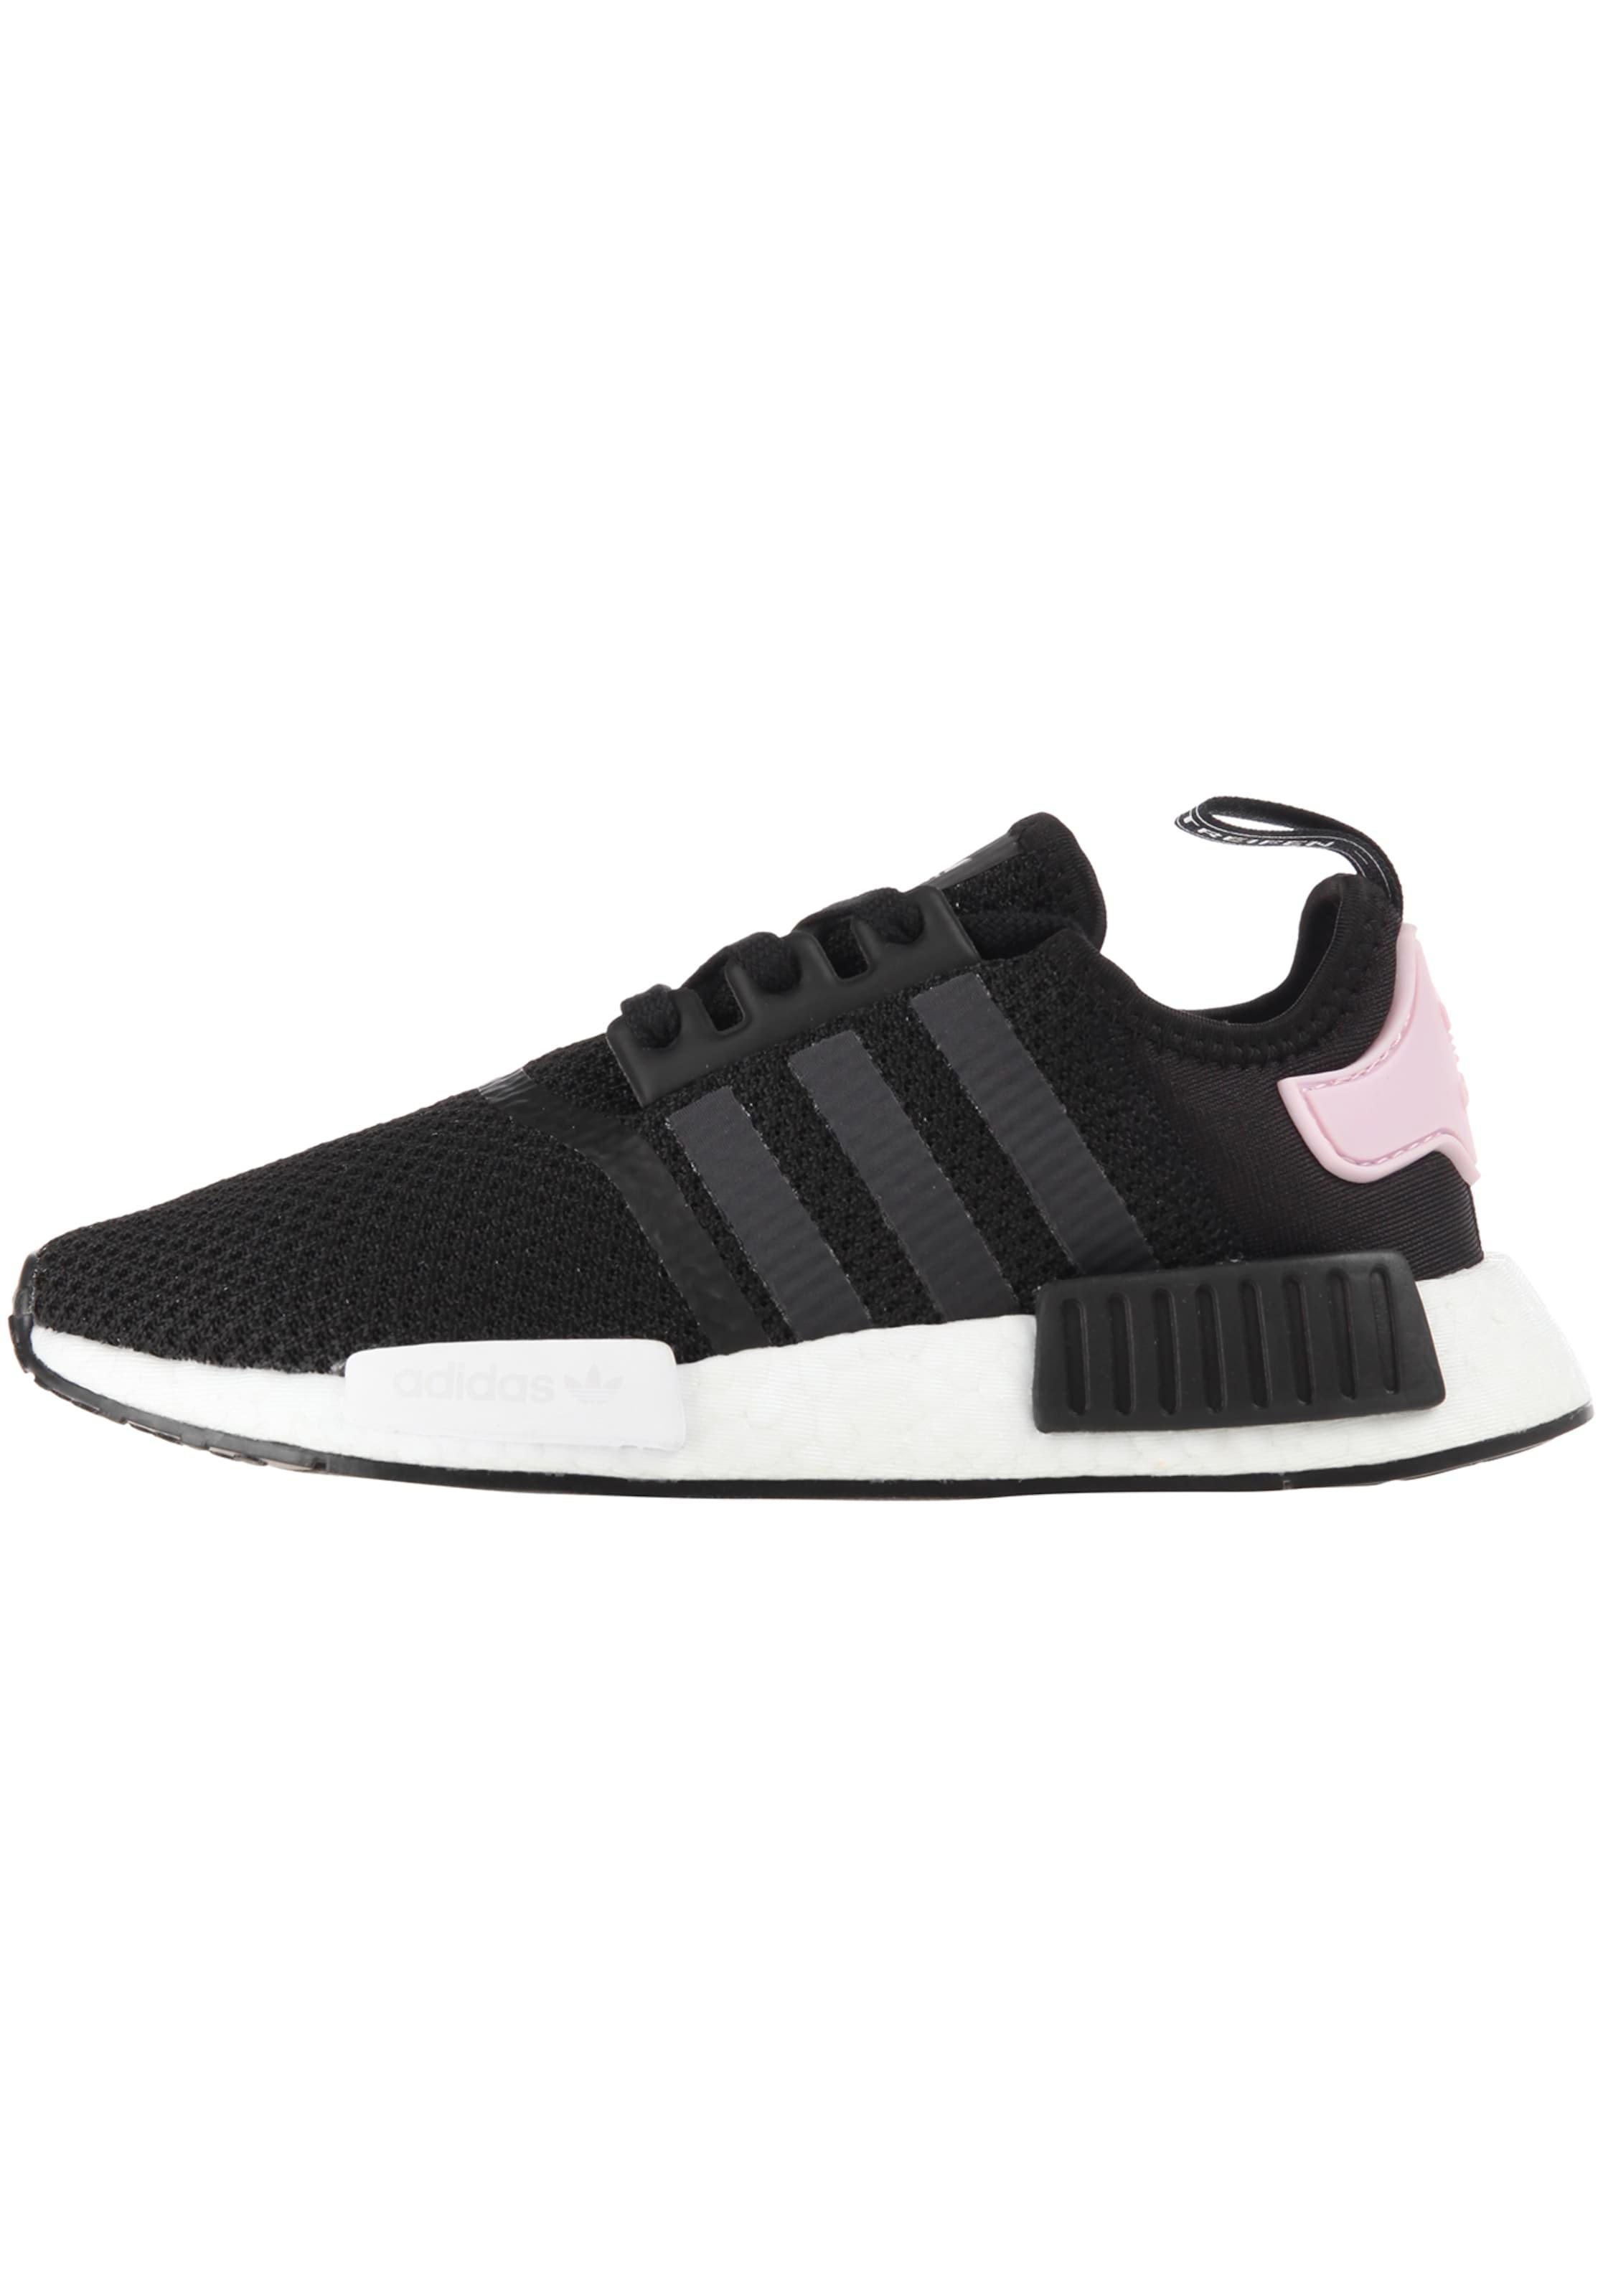 ADIDAS ORIGINALS |  NMD_R1  Sneaker